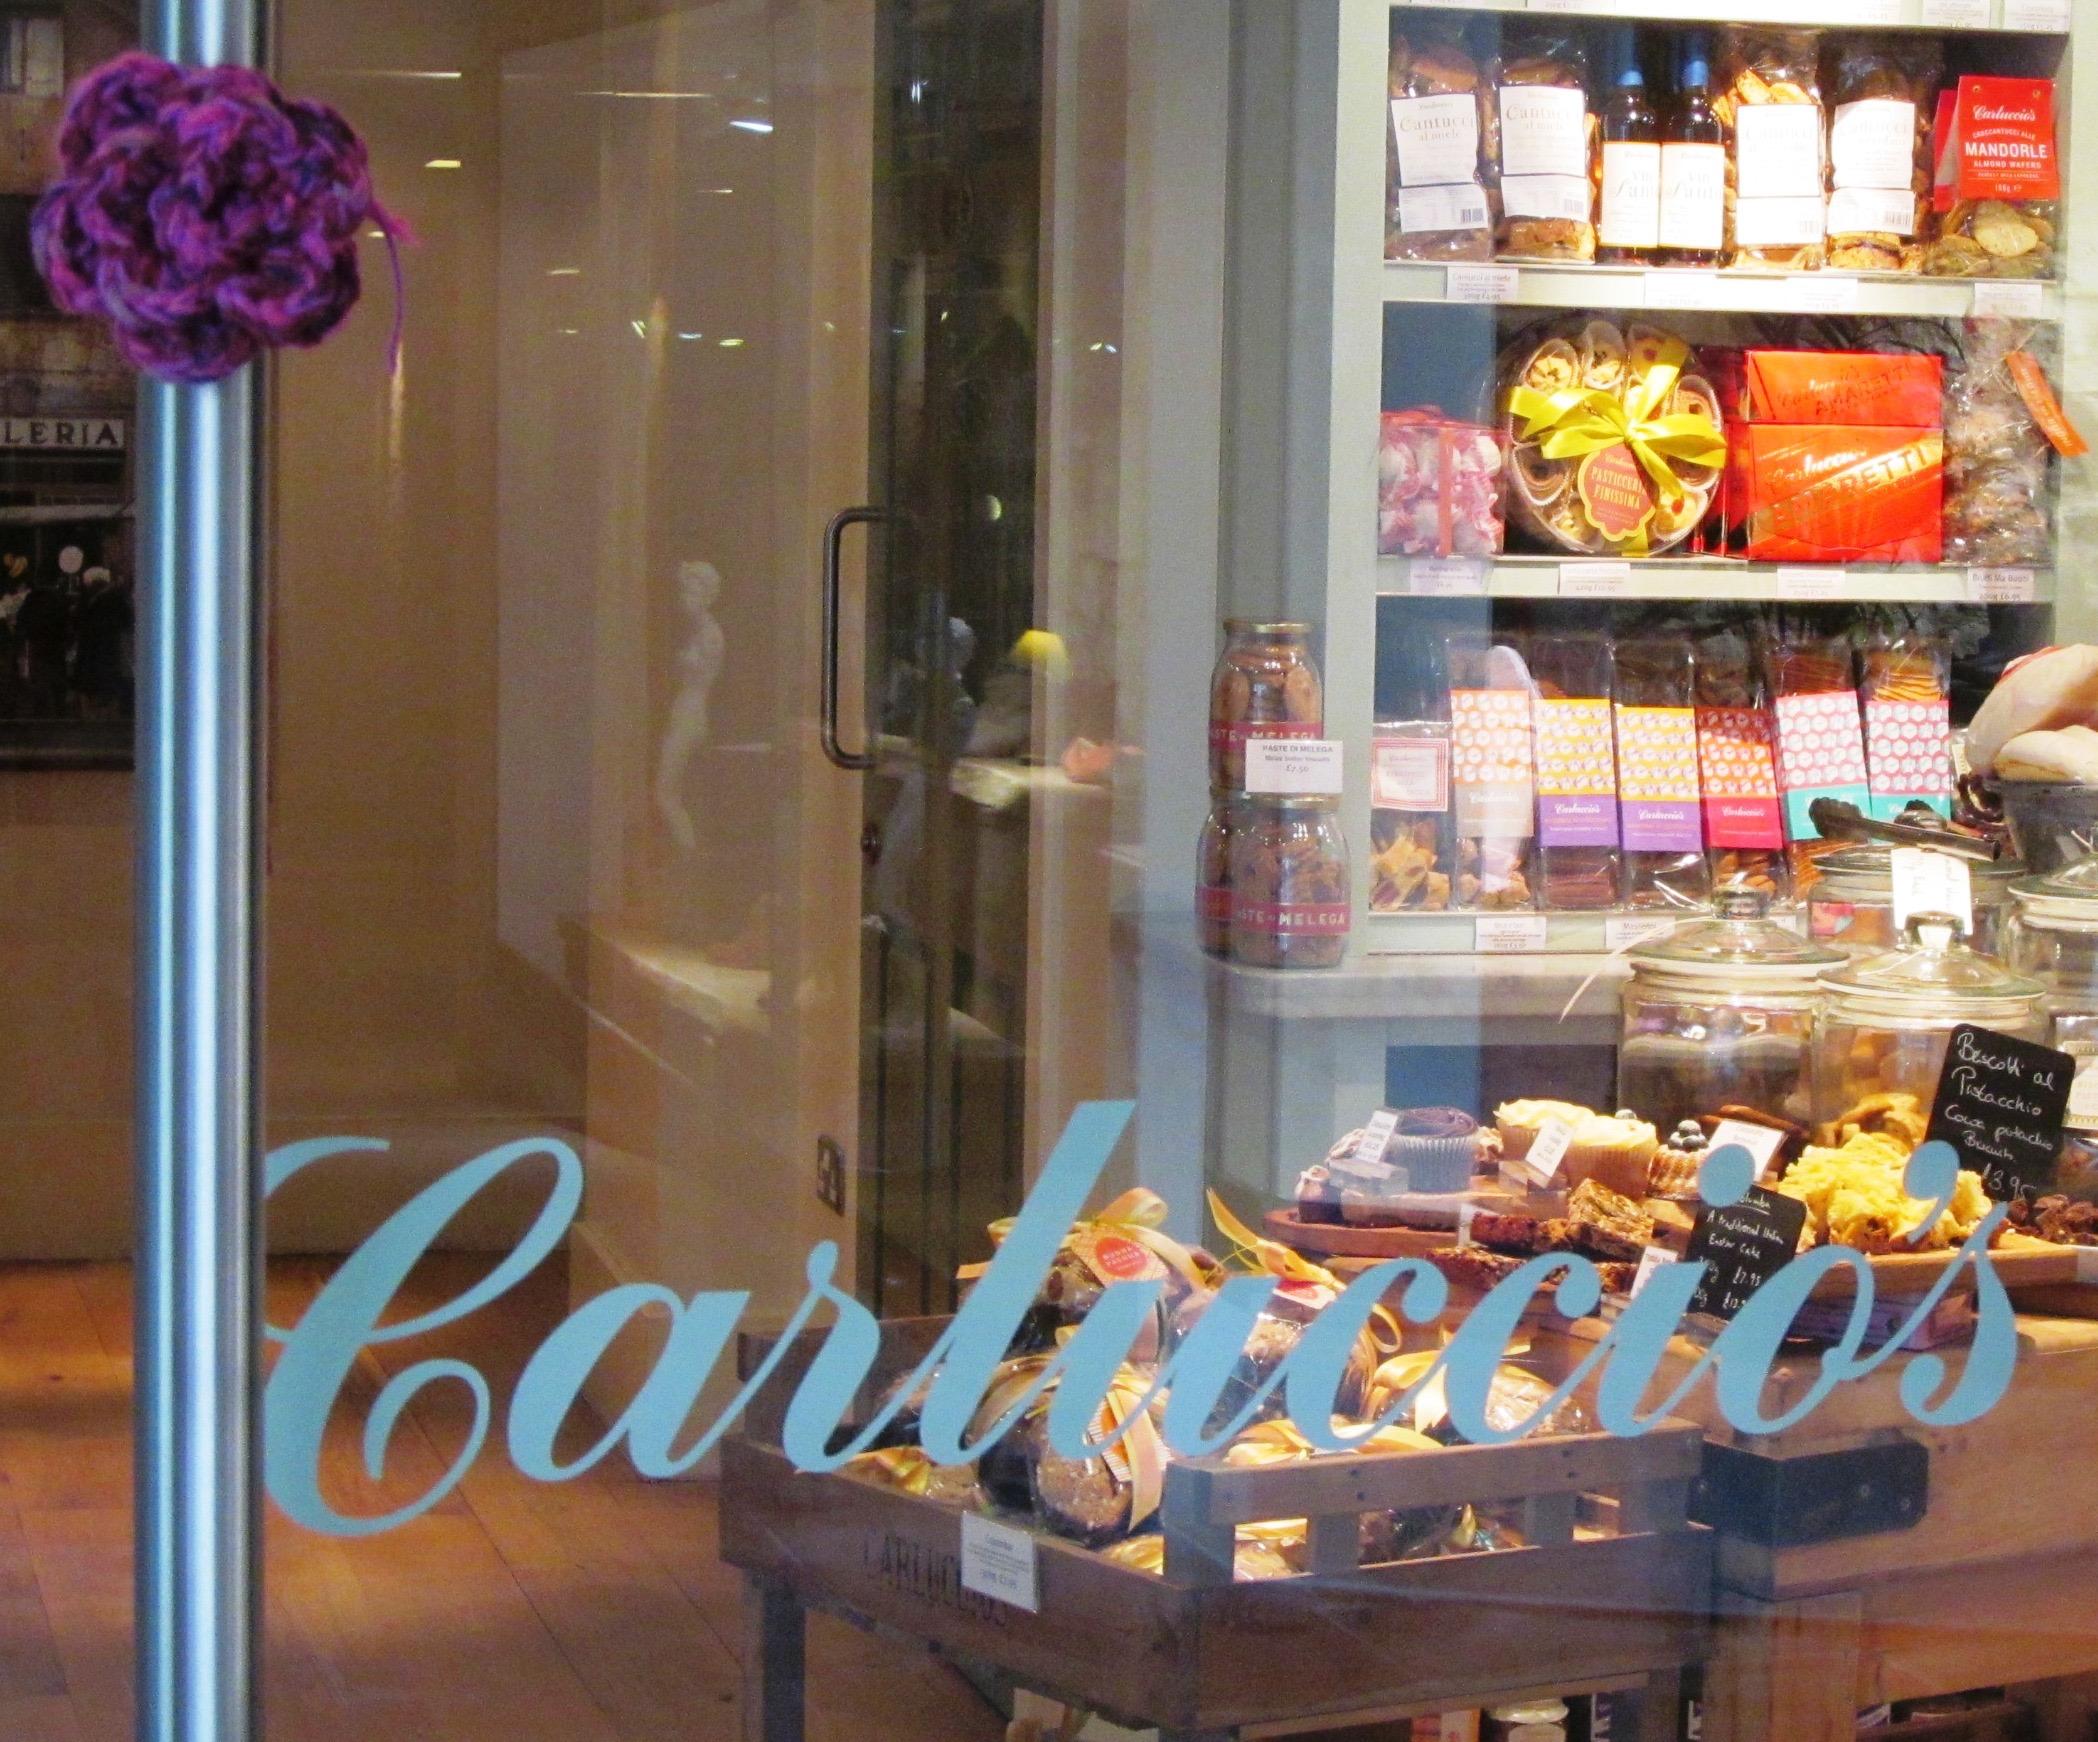 Crochet rose on Carluccio's door